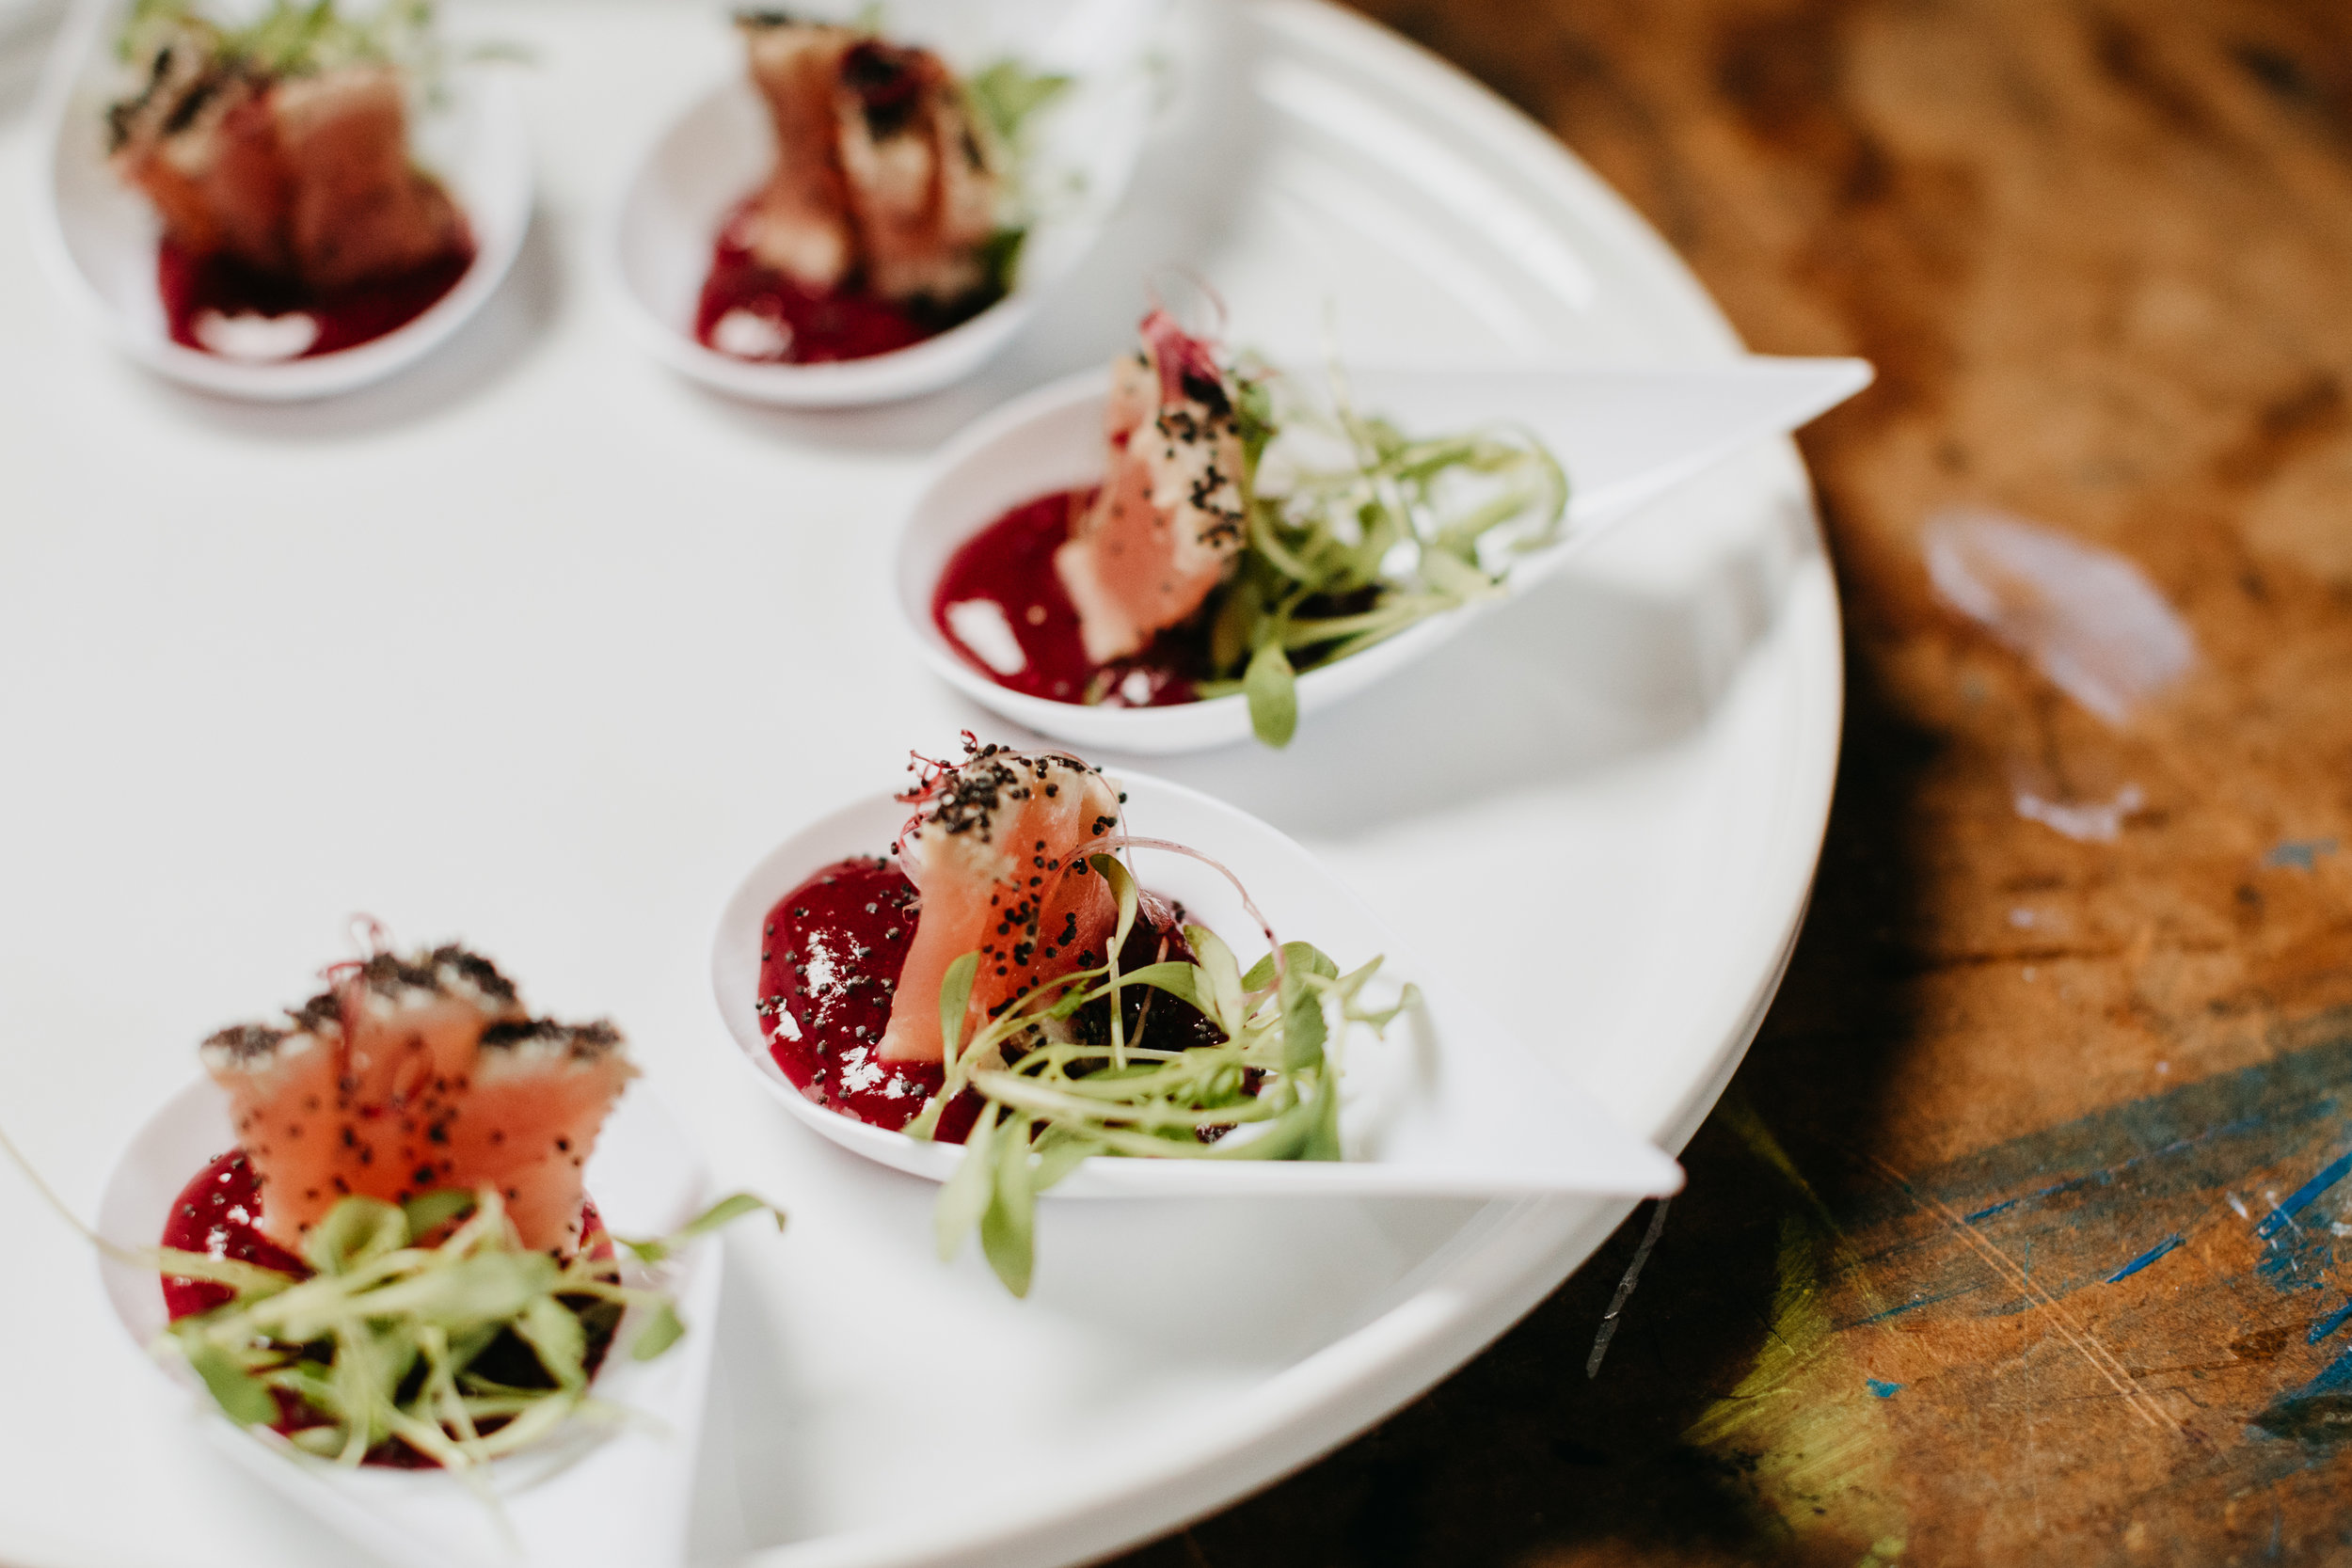 Ahi Tuna with Poppyseed and Strawberry-Rhubarb Jam